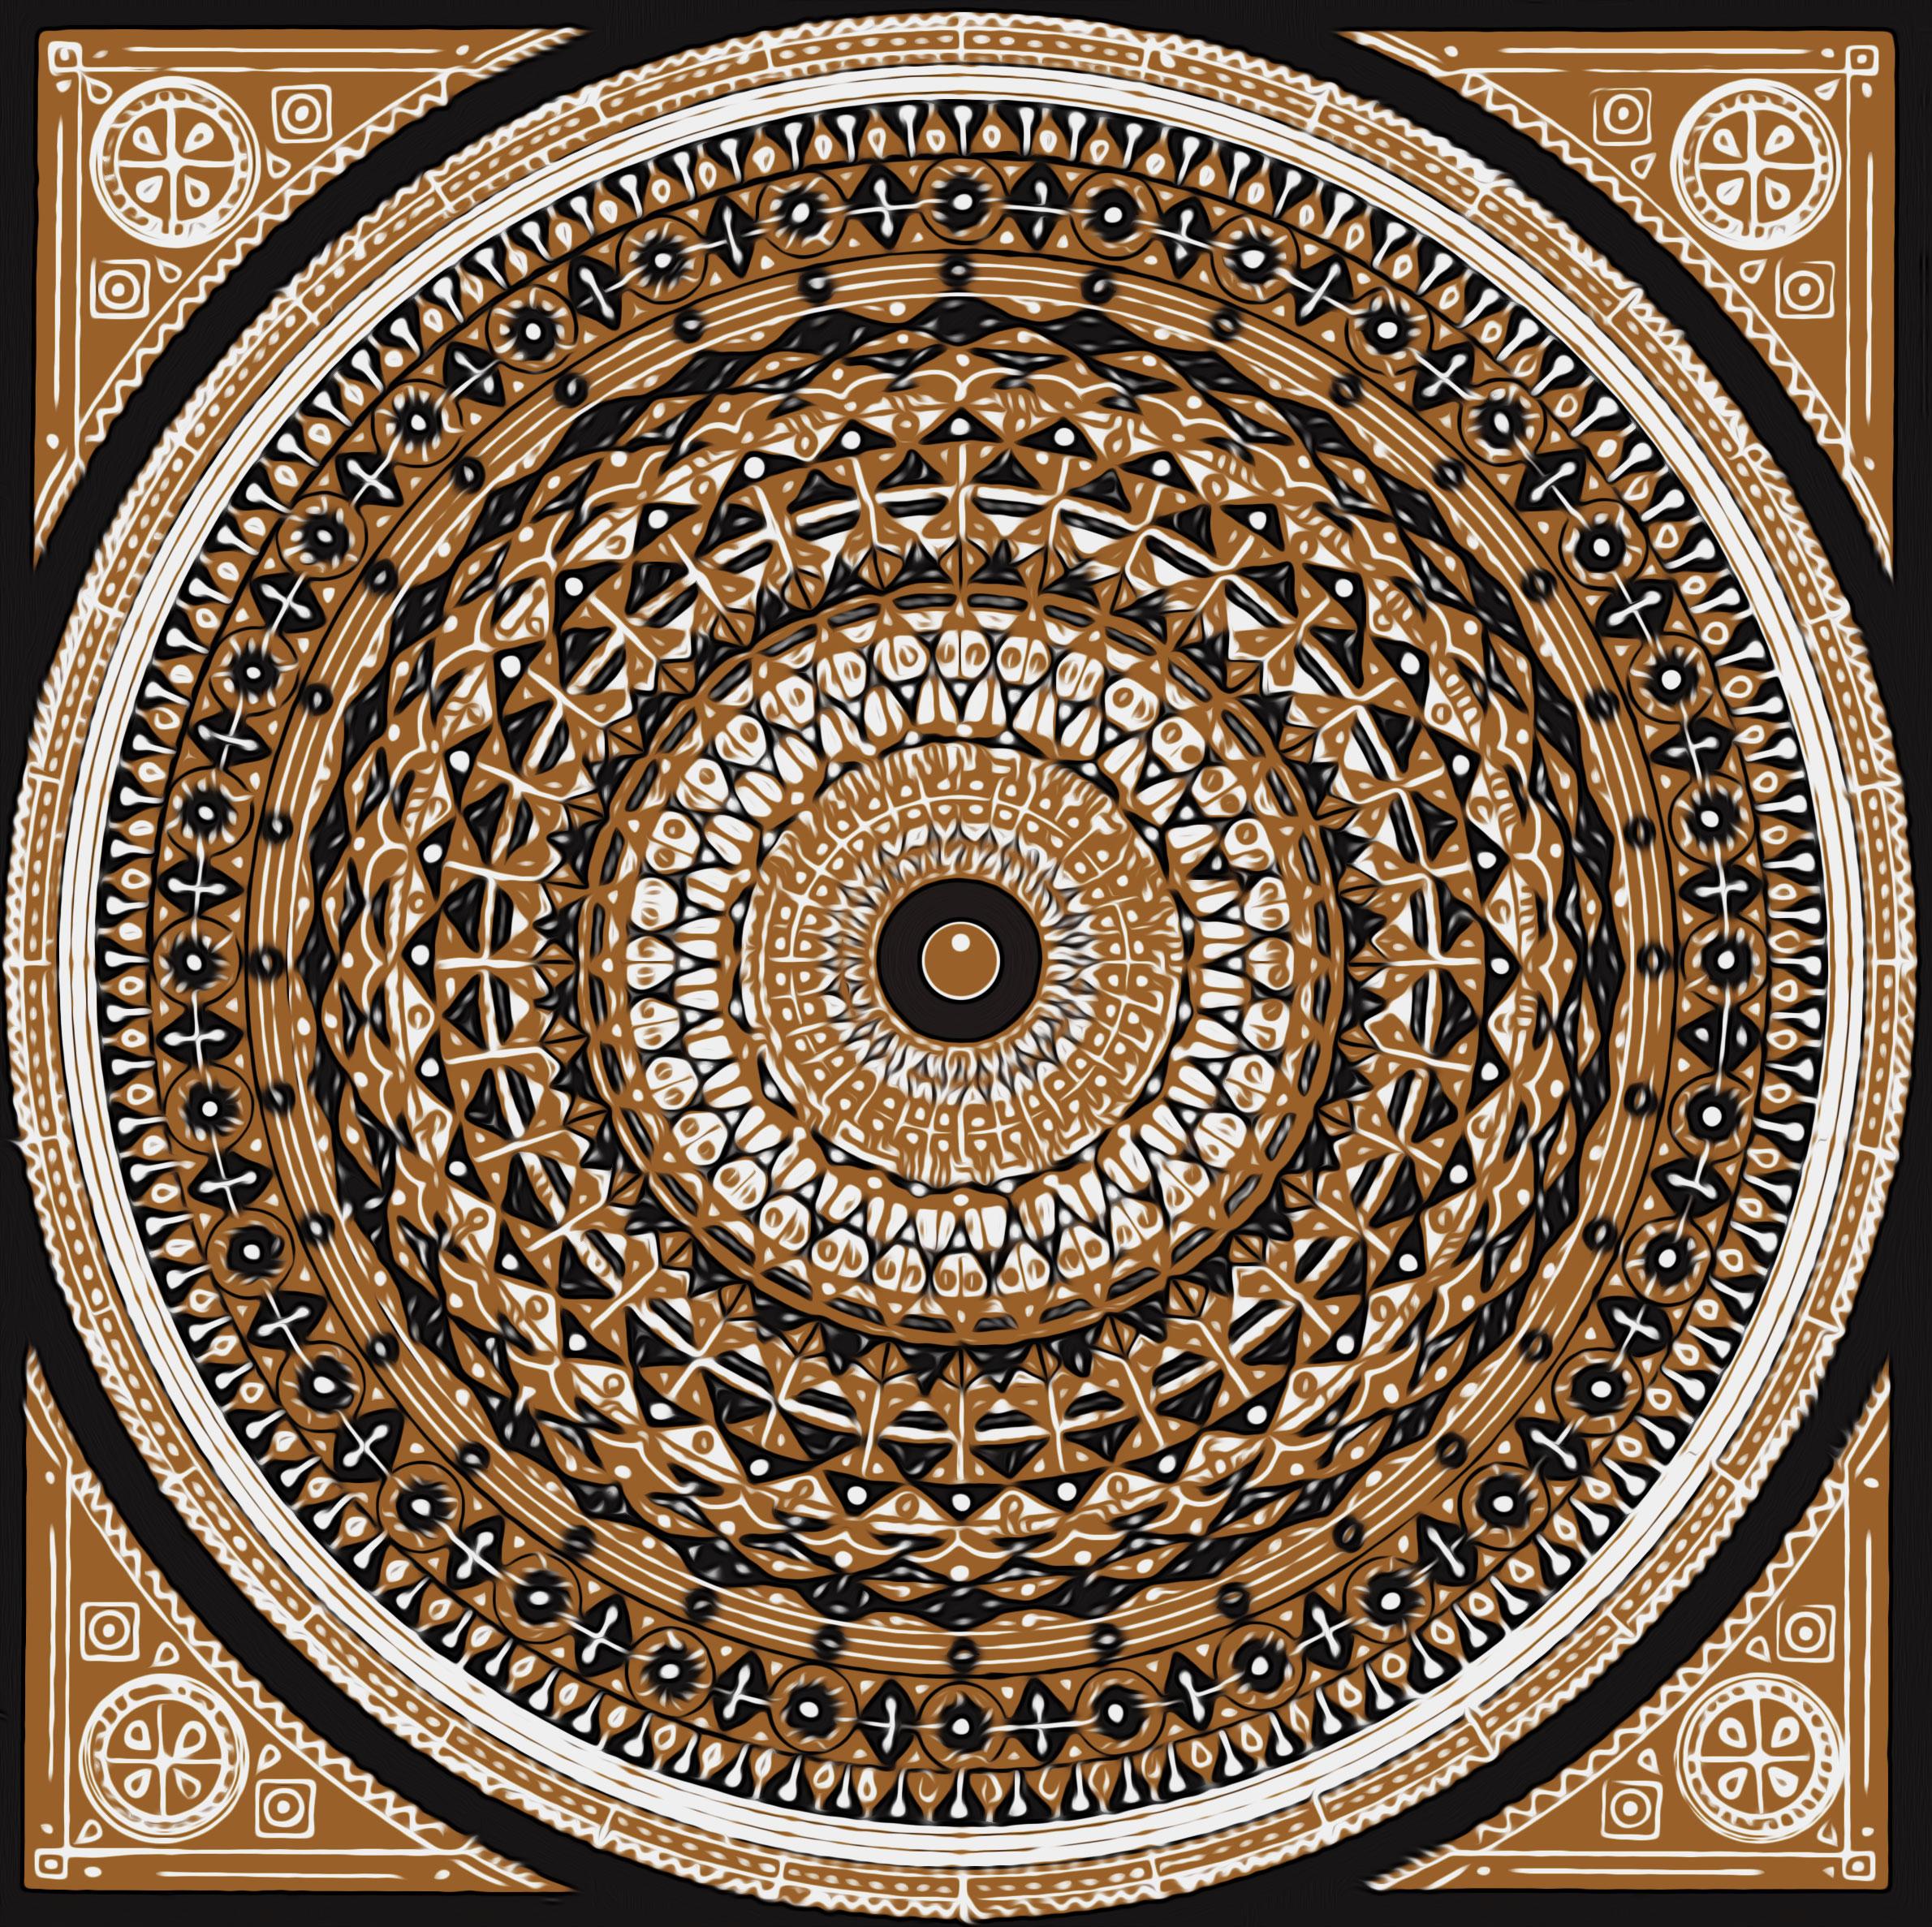 Islamic Mandala by massaad on DeviantArt